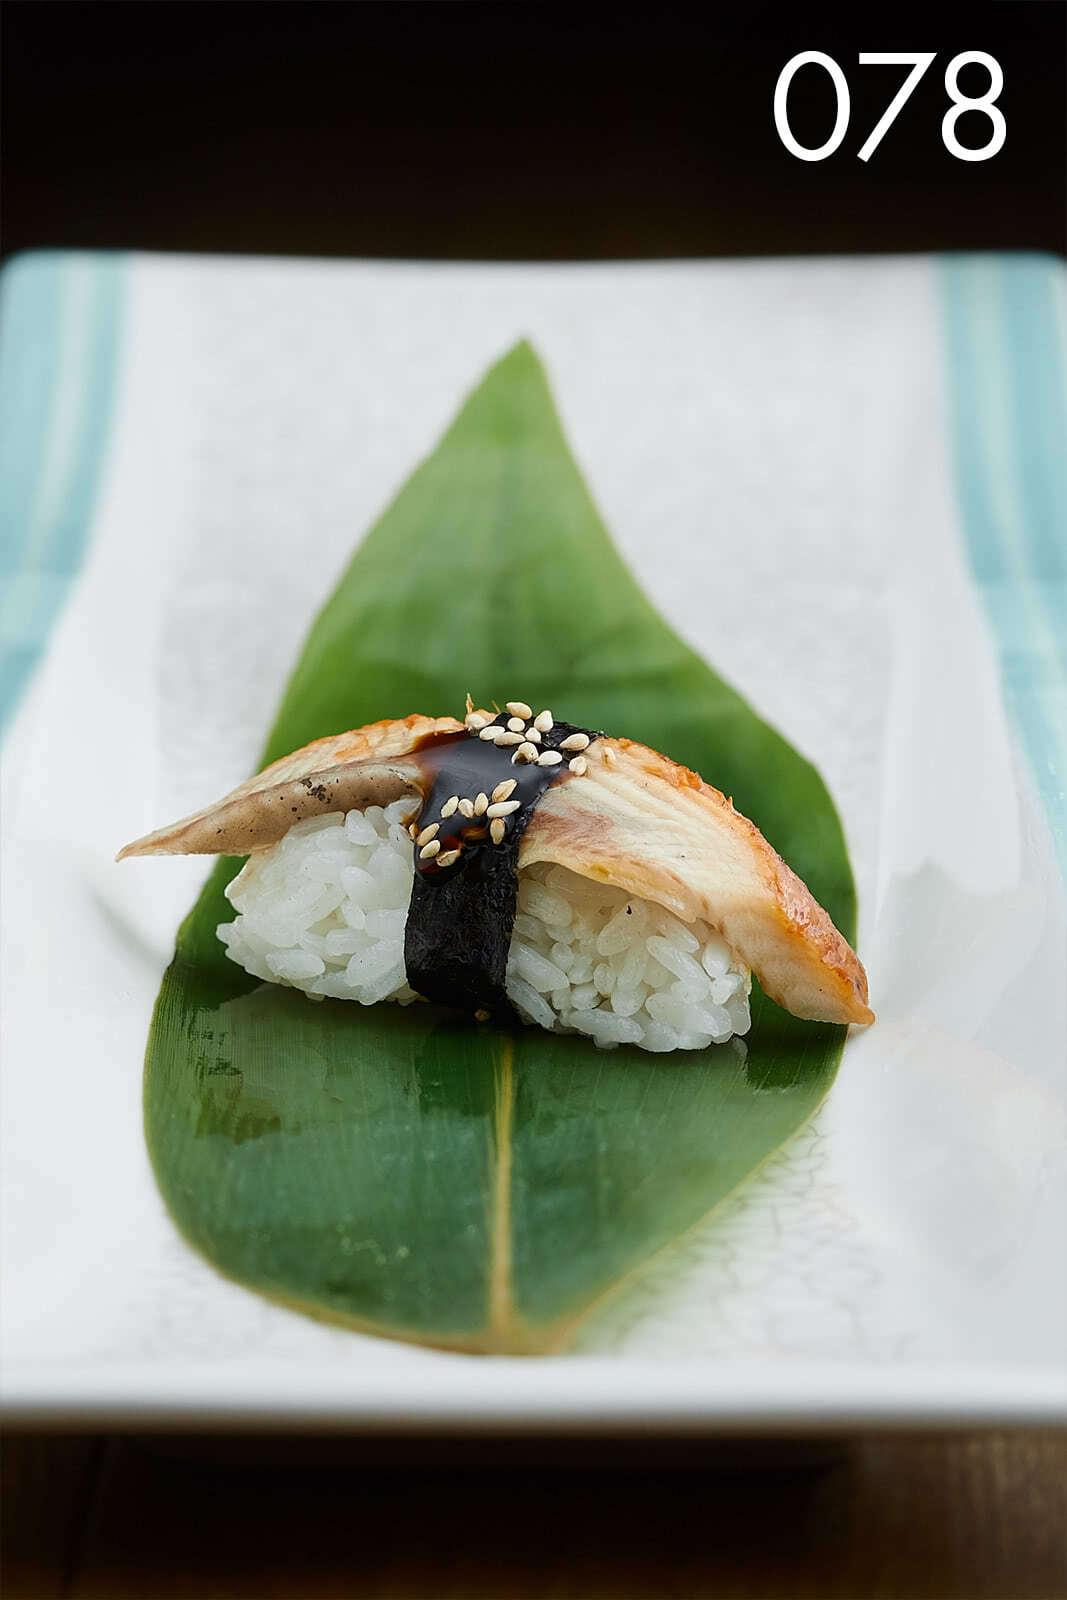 суши нигири с угрем в ресторане Веранда